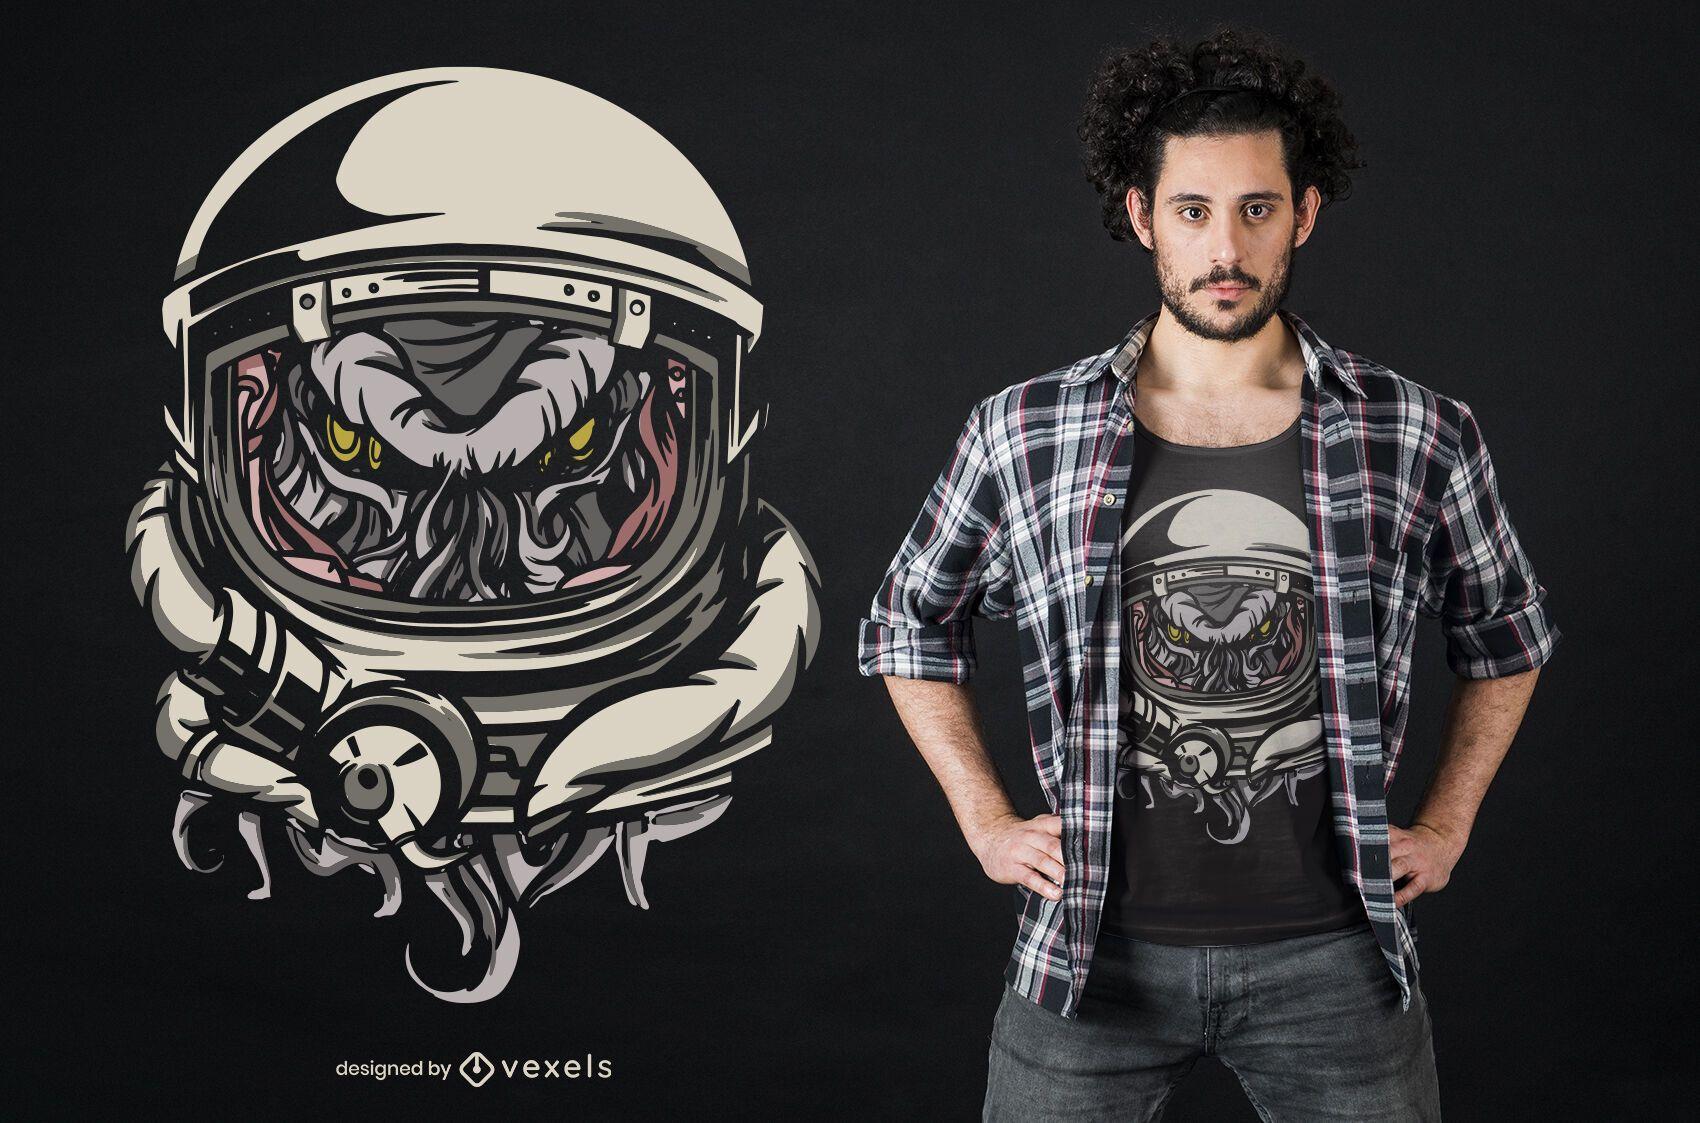 Space cthulhu t-shirt design